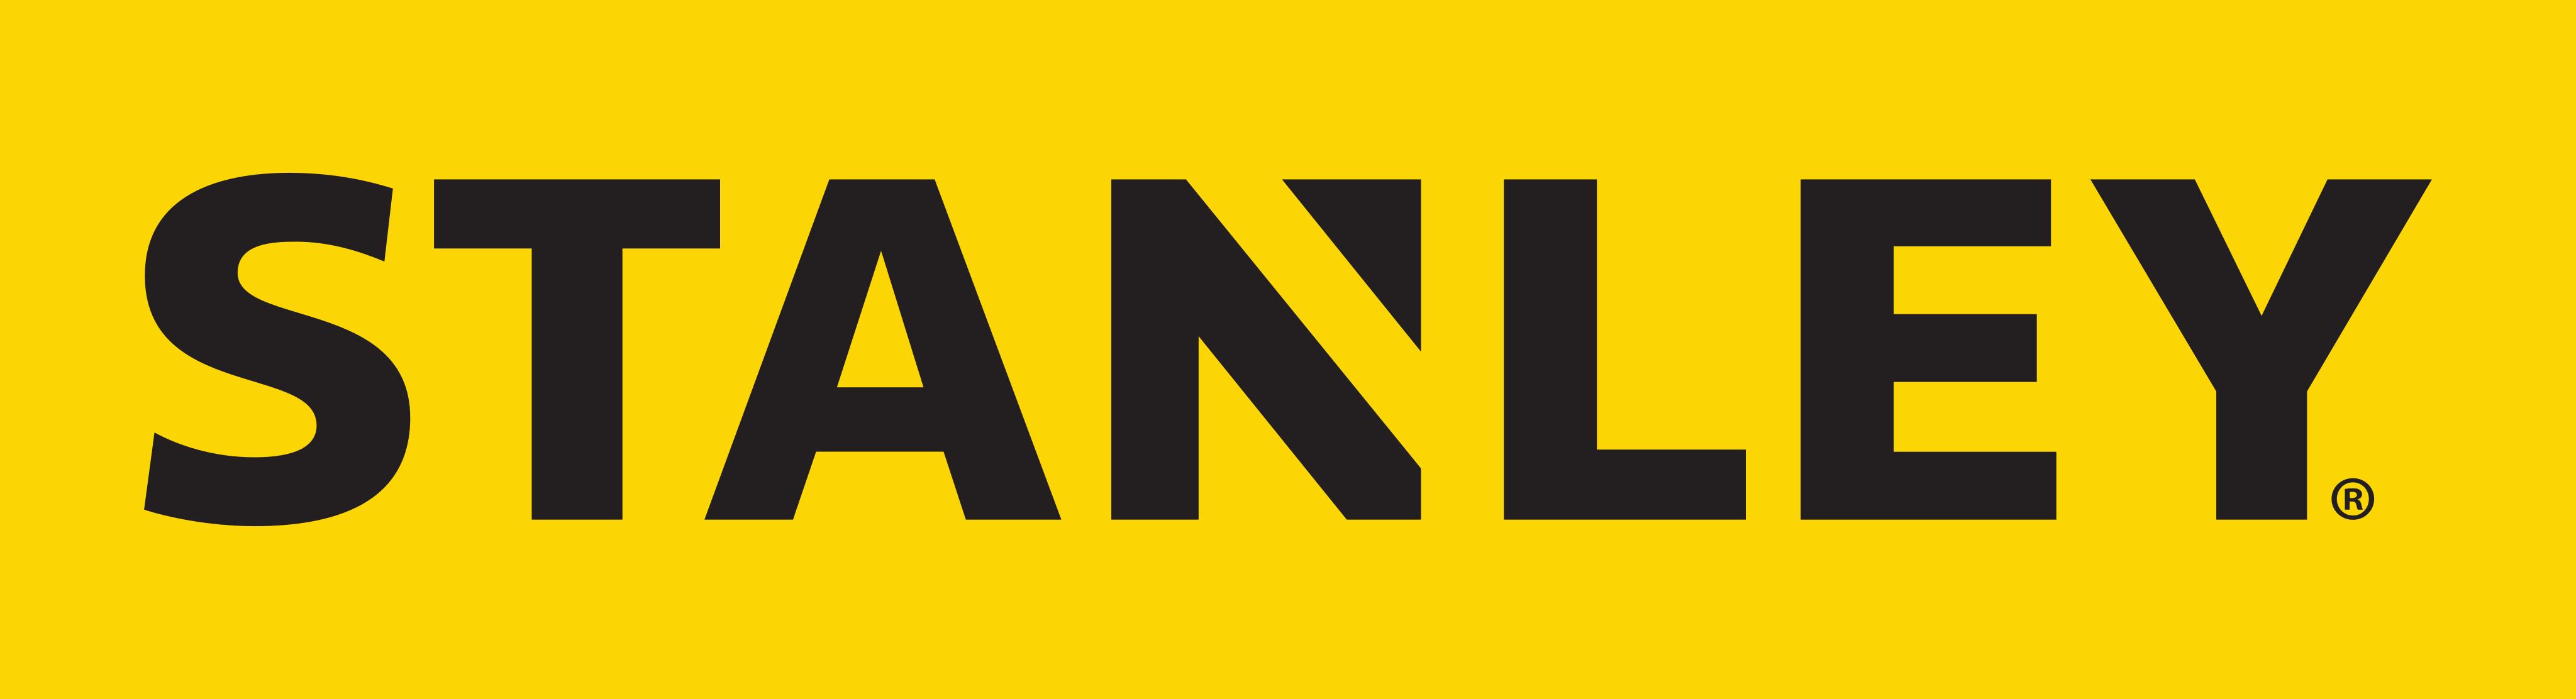 stanley logo - Stanley Logo